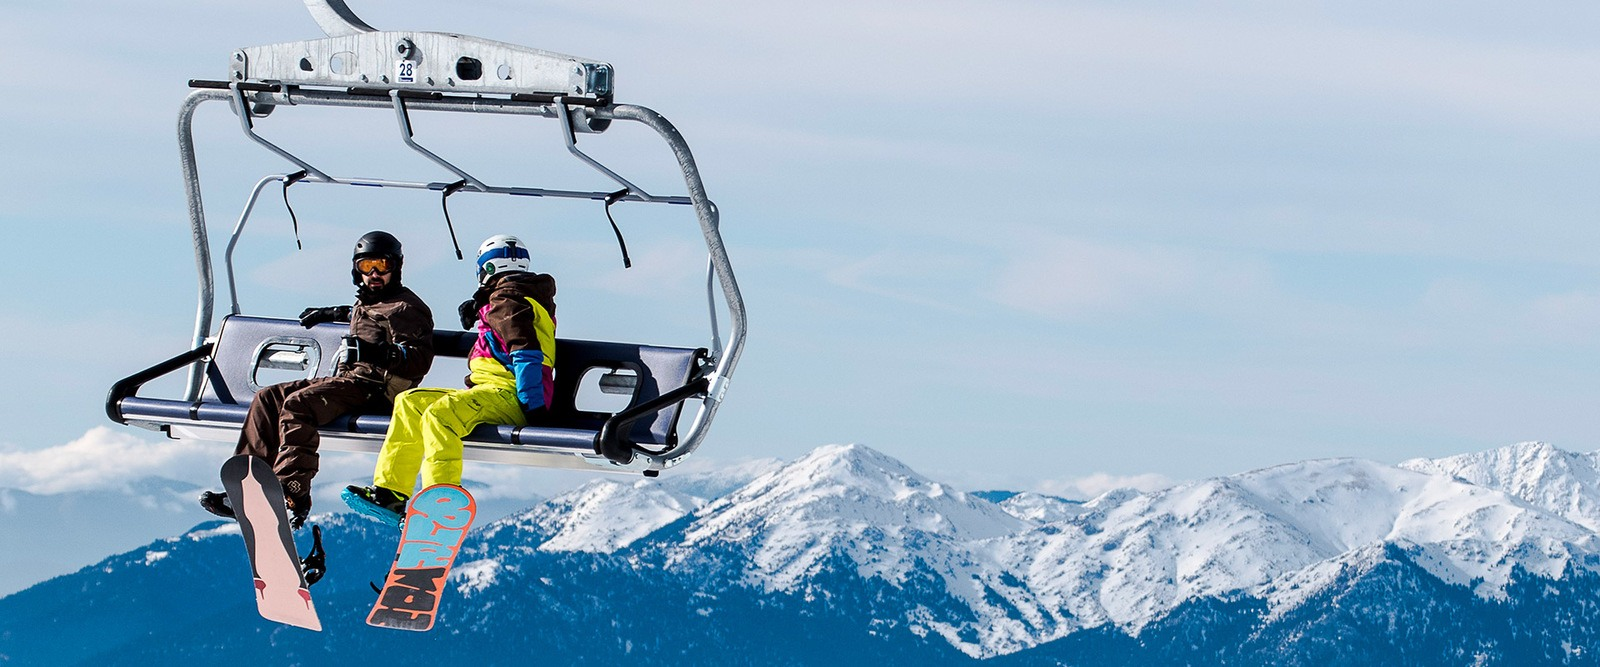 Snowboard - Trentino